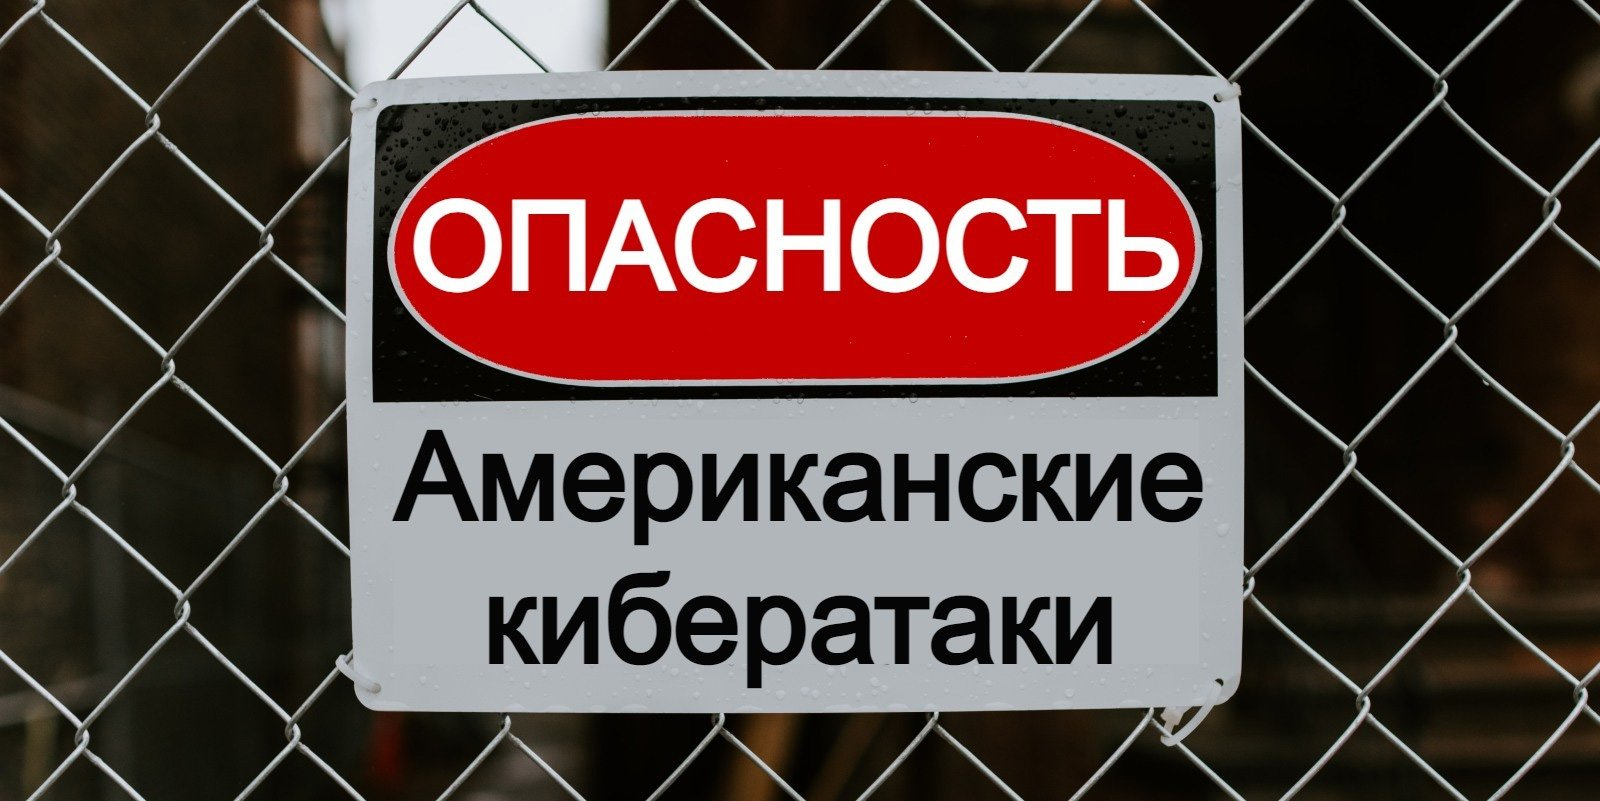 Russian Government Warns Of US Retaliatory Cyberattacks